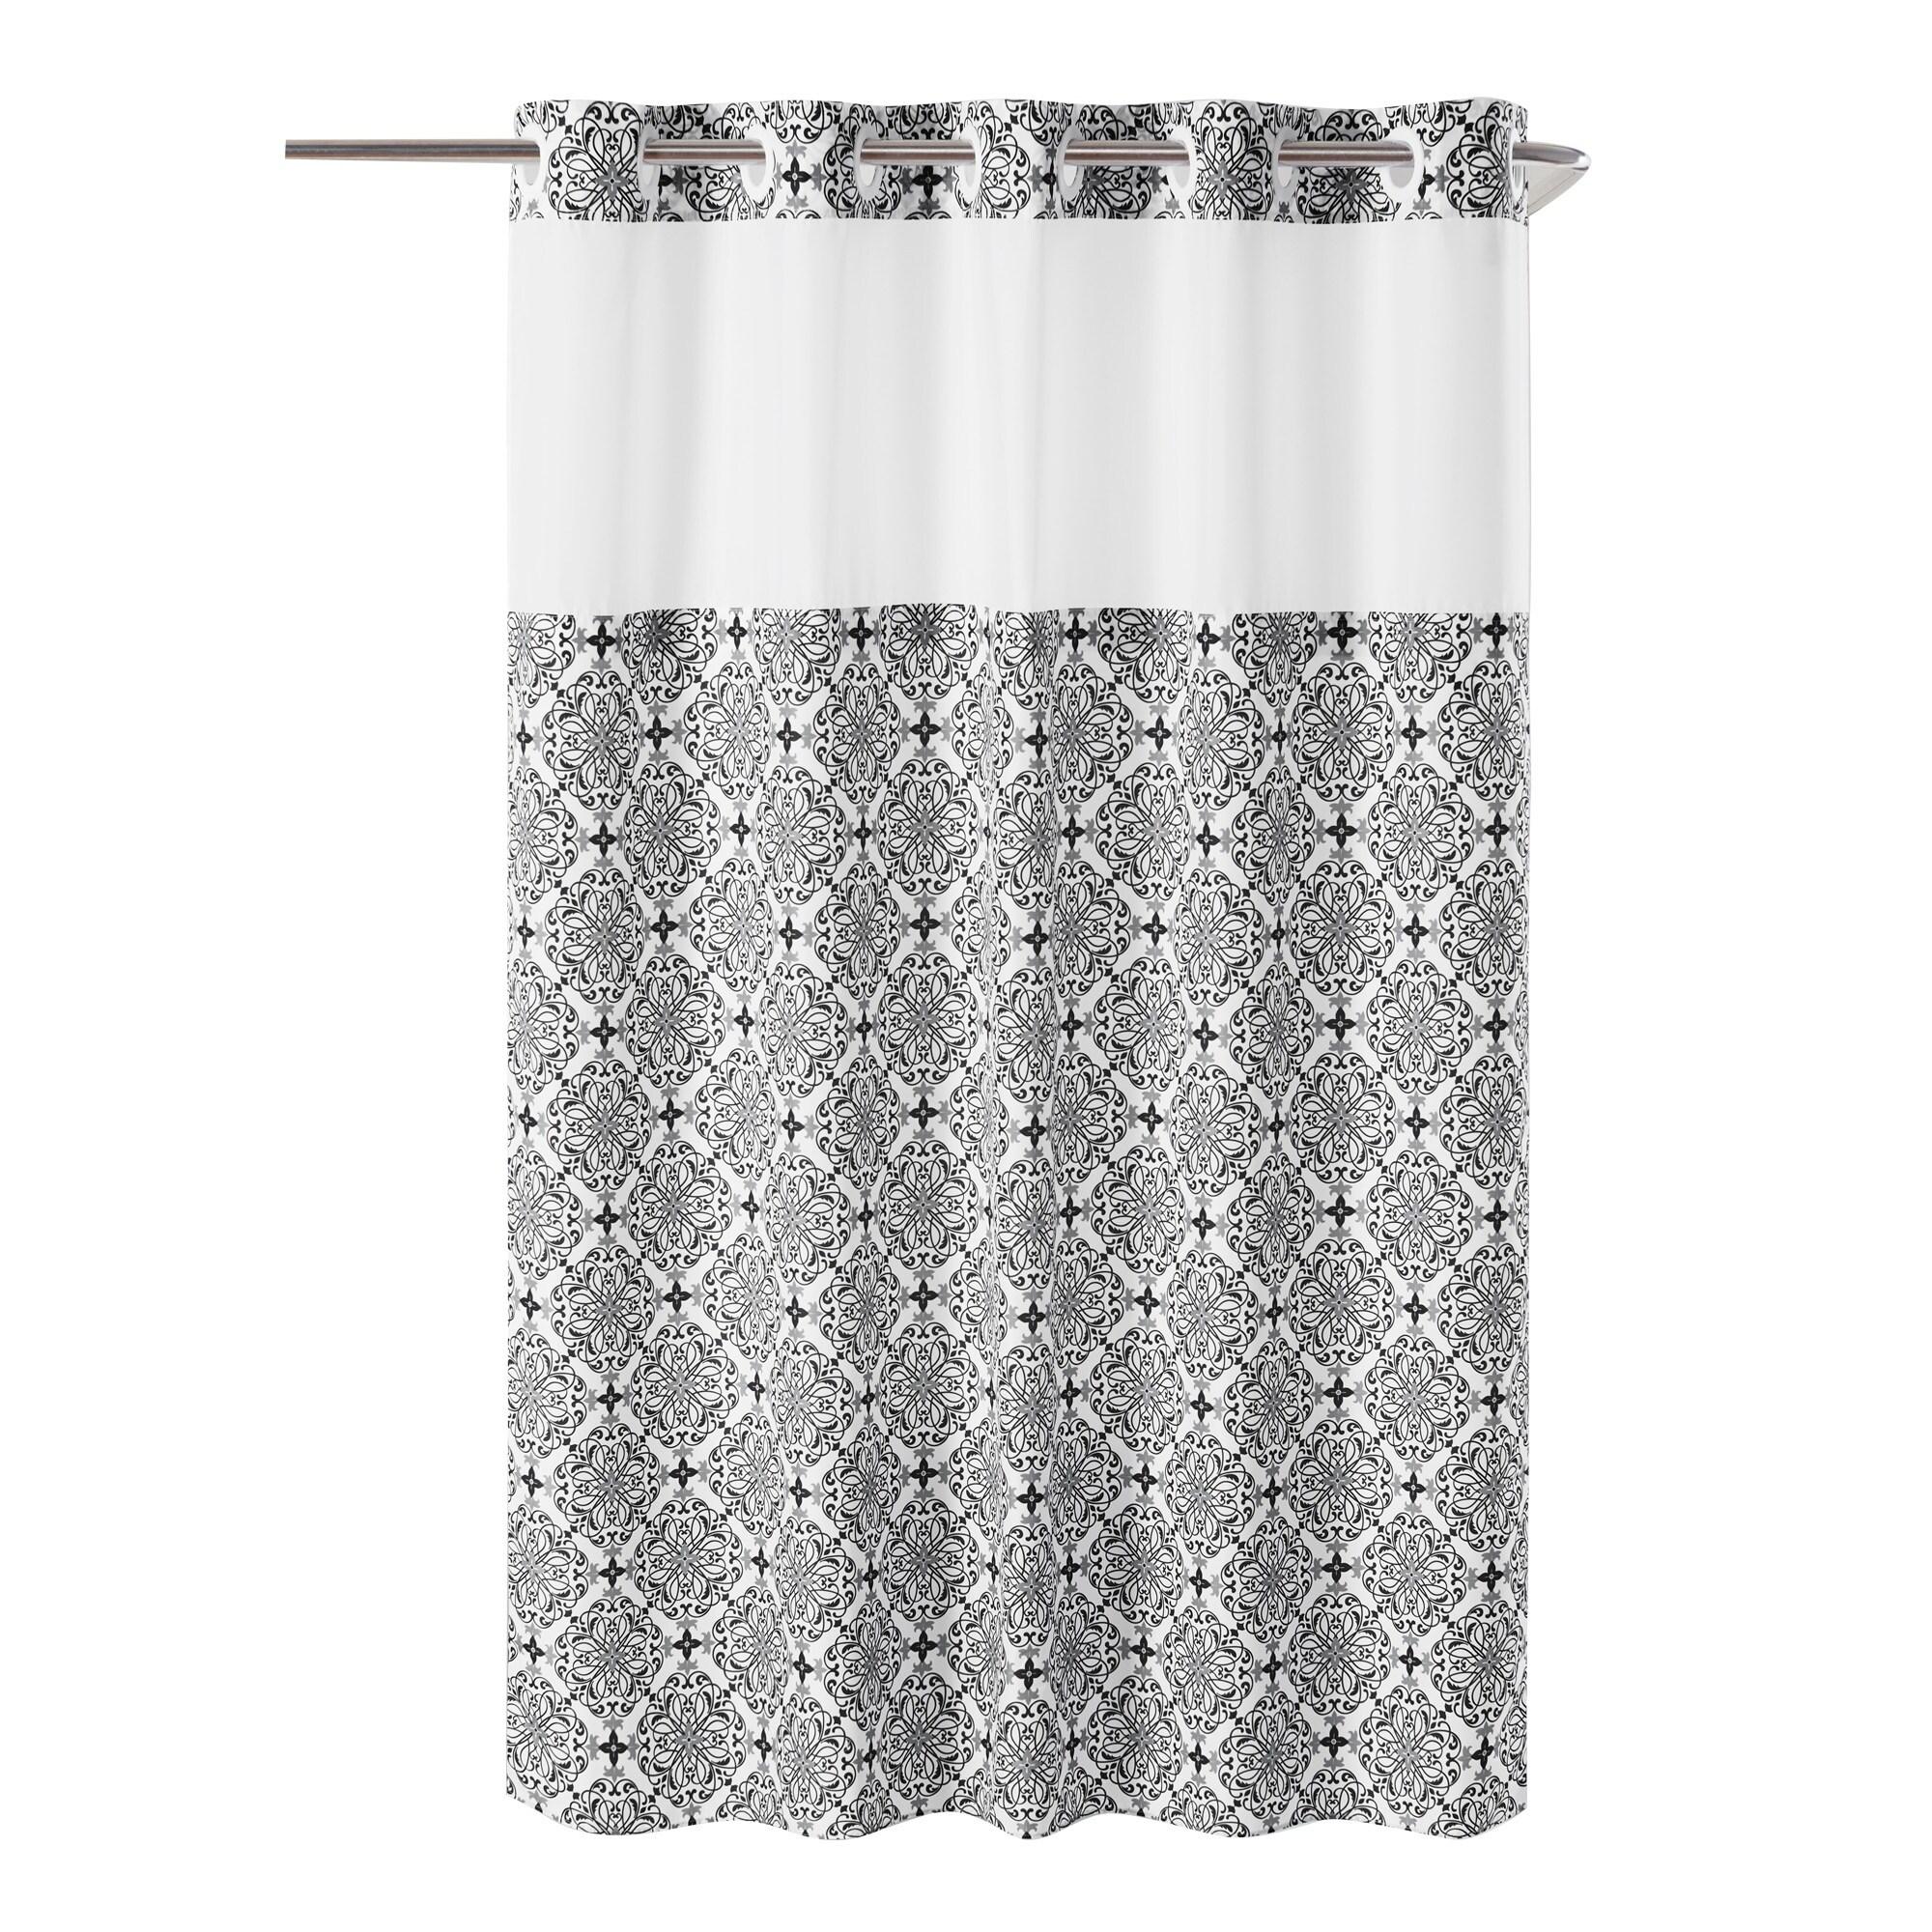 Porch Den Landmark Black Floral Trellis Hookless Shower Curtain With Peva Liner On Sale Overstock 28727945